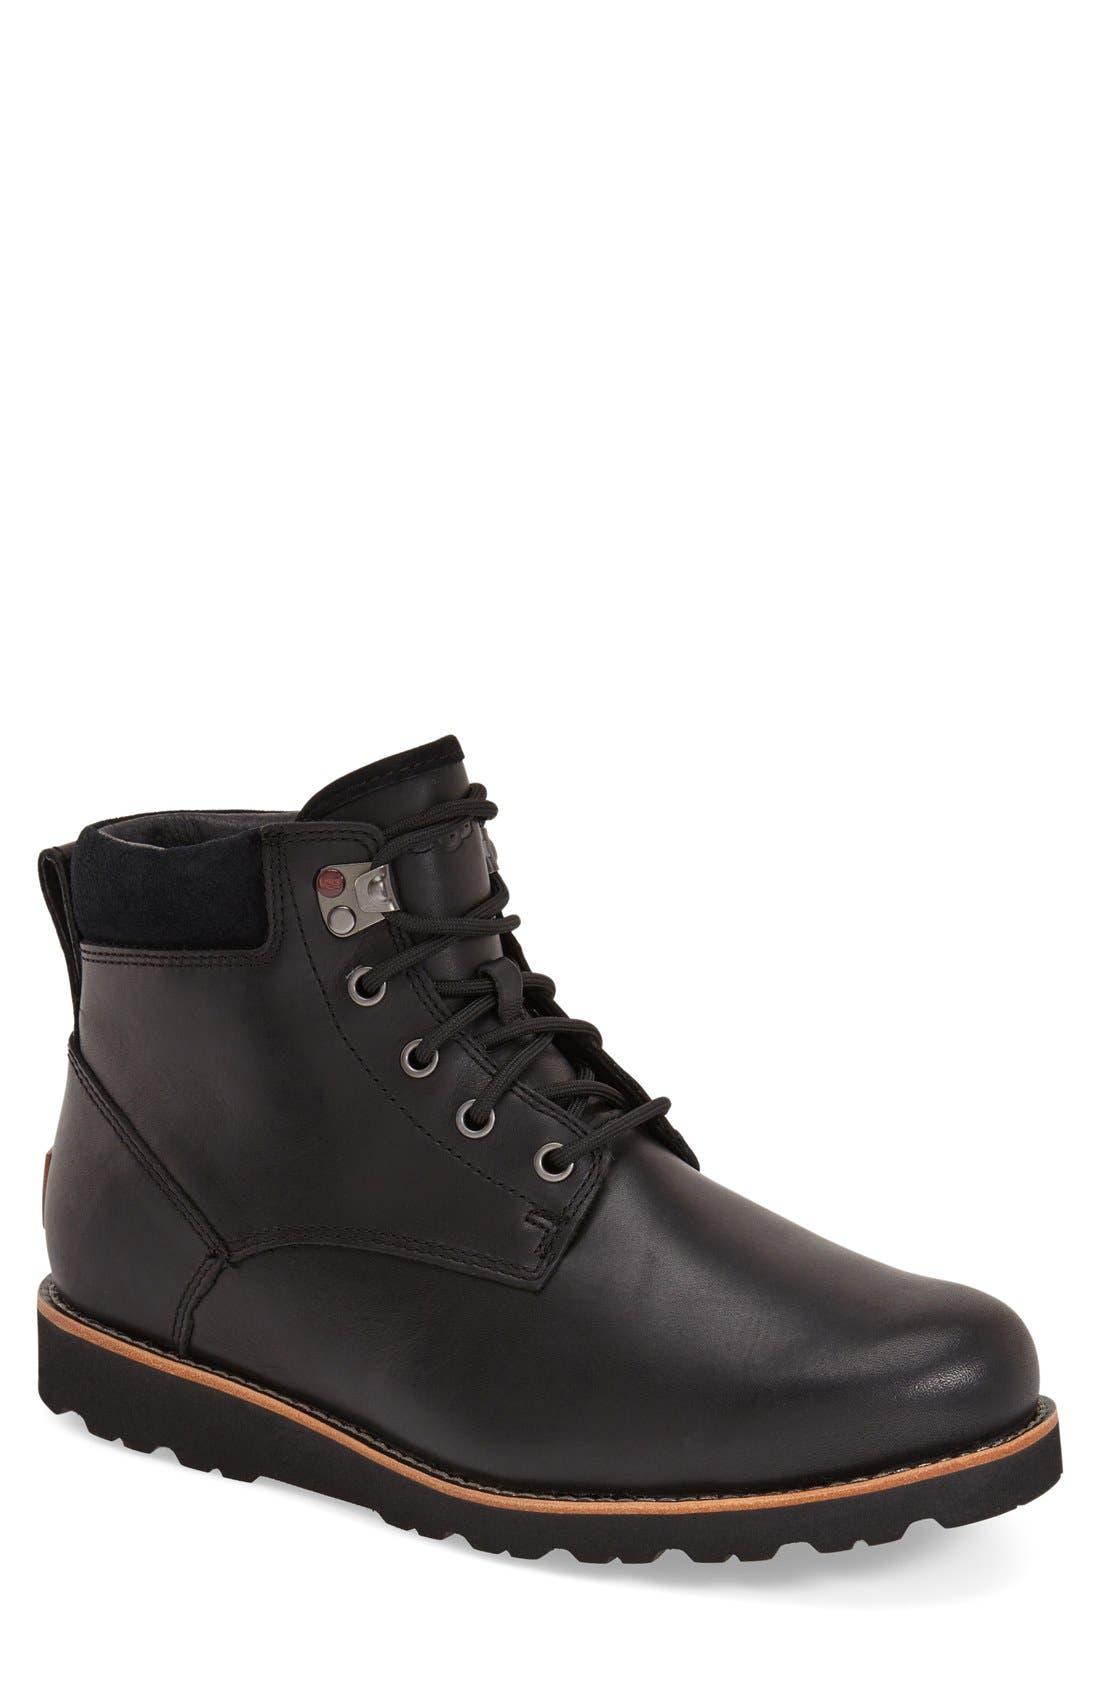 Seton Waterproof Chukka Boot,                         Main,                         color, BLACK